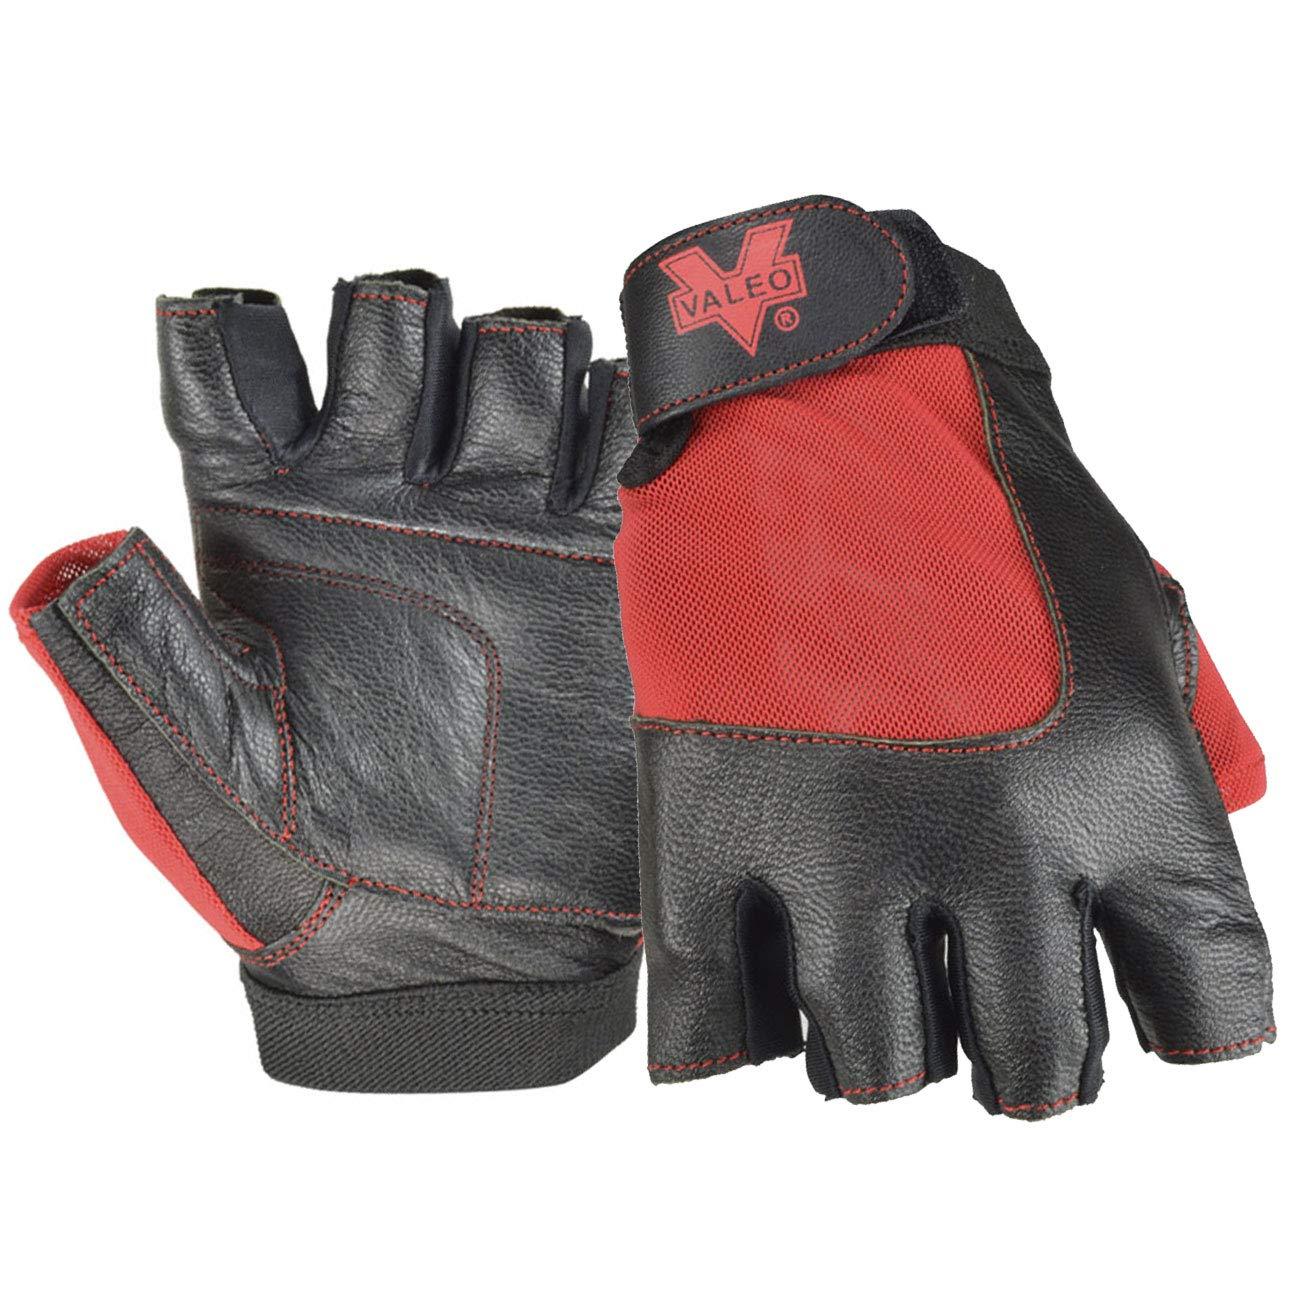 Valeo Industrial V336 Material Handling Fingerless Leather Gloves with Padded Palms, VI5159, Pair, Red, Medium